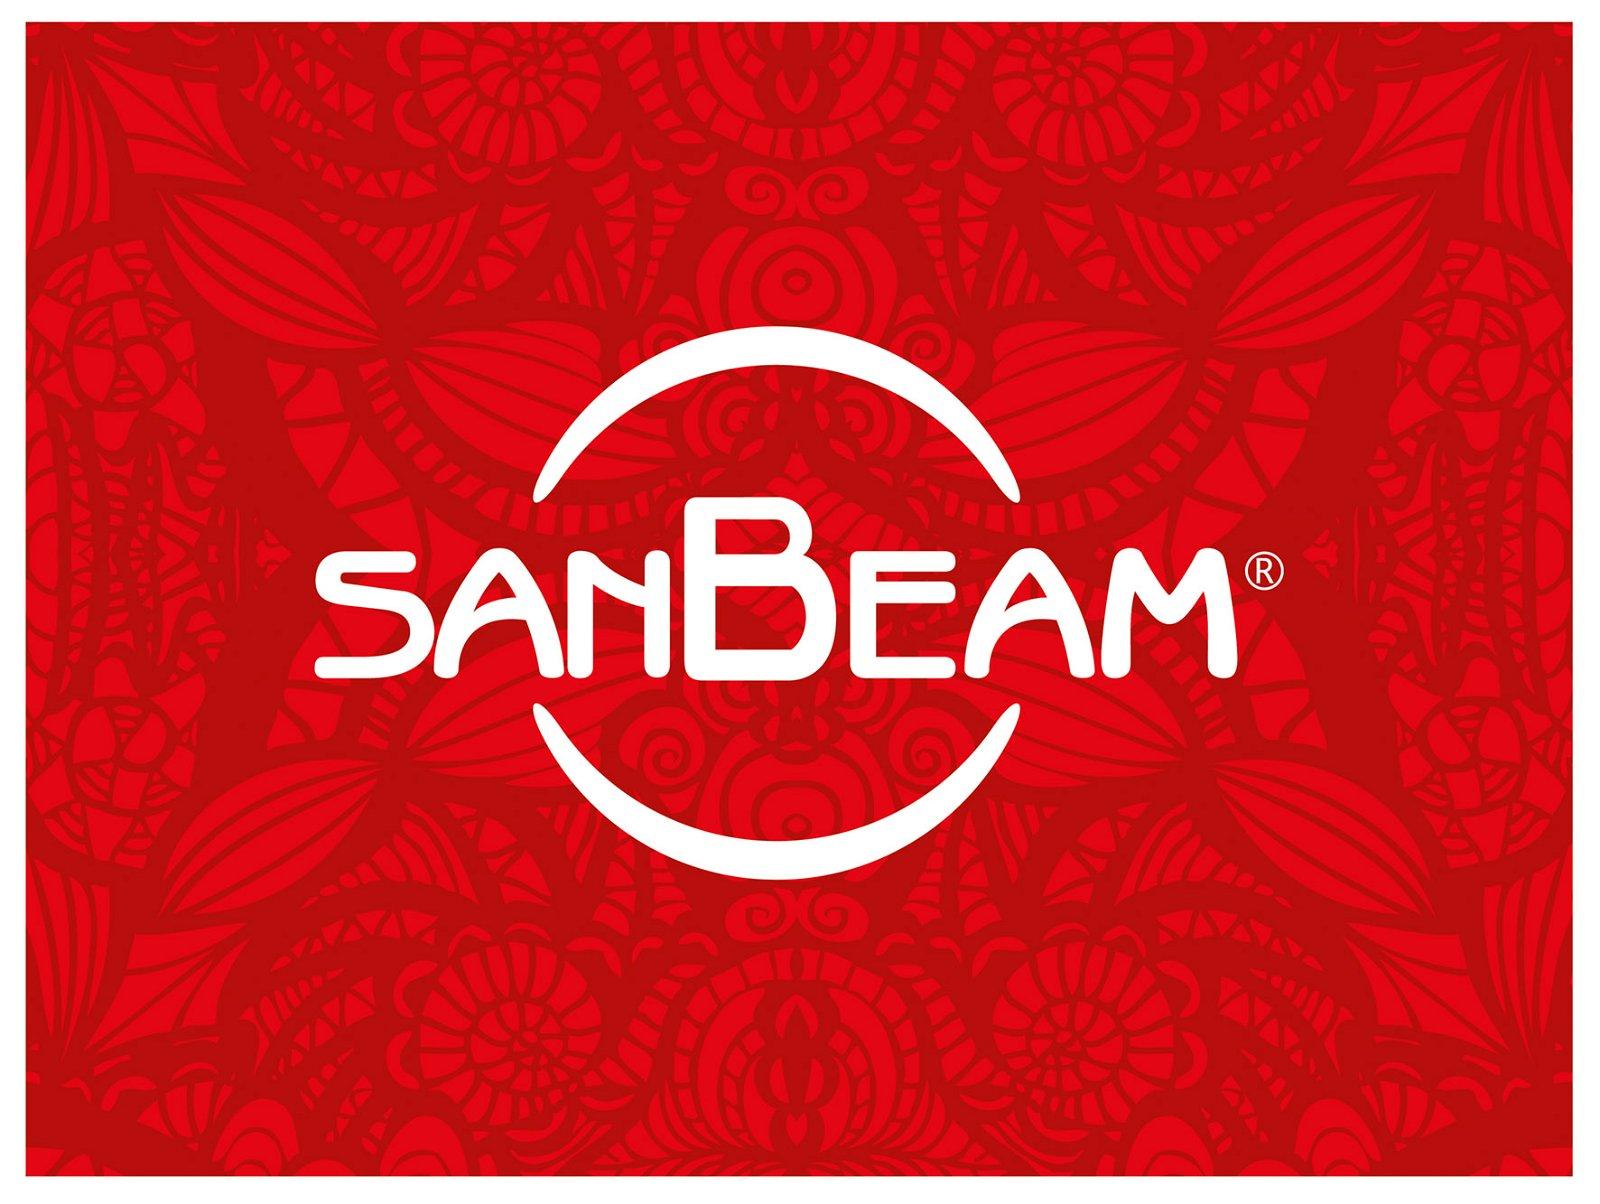 SanBeam